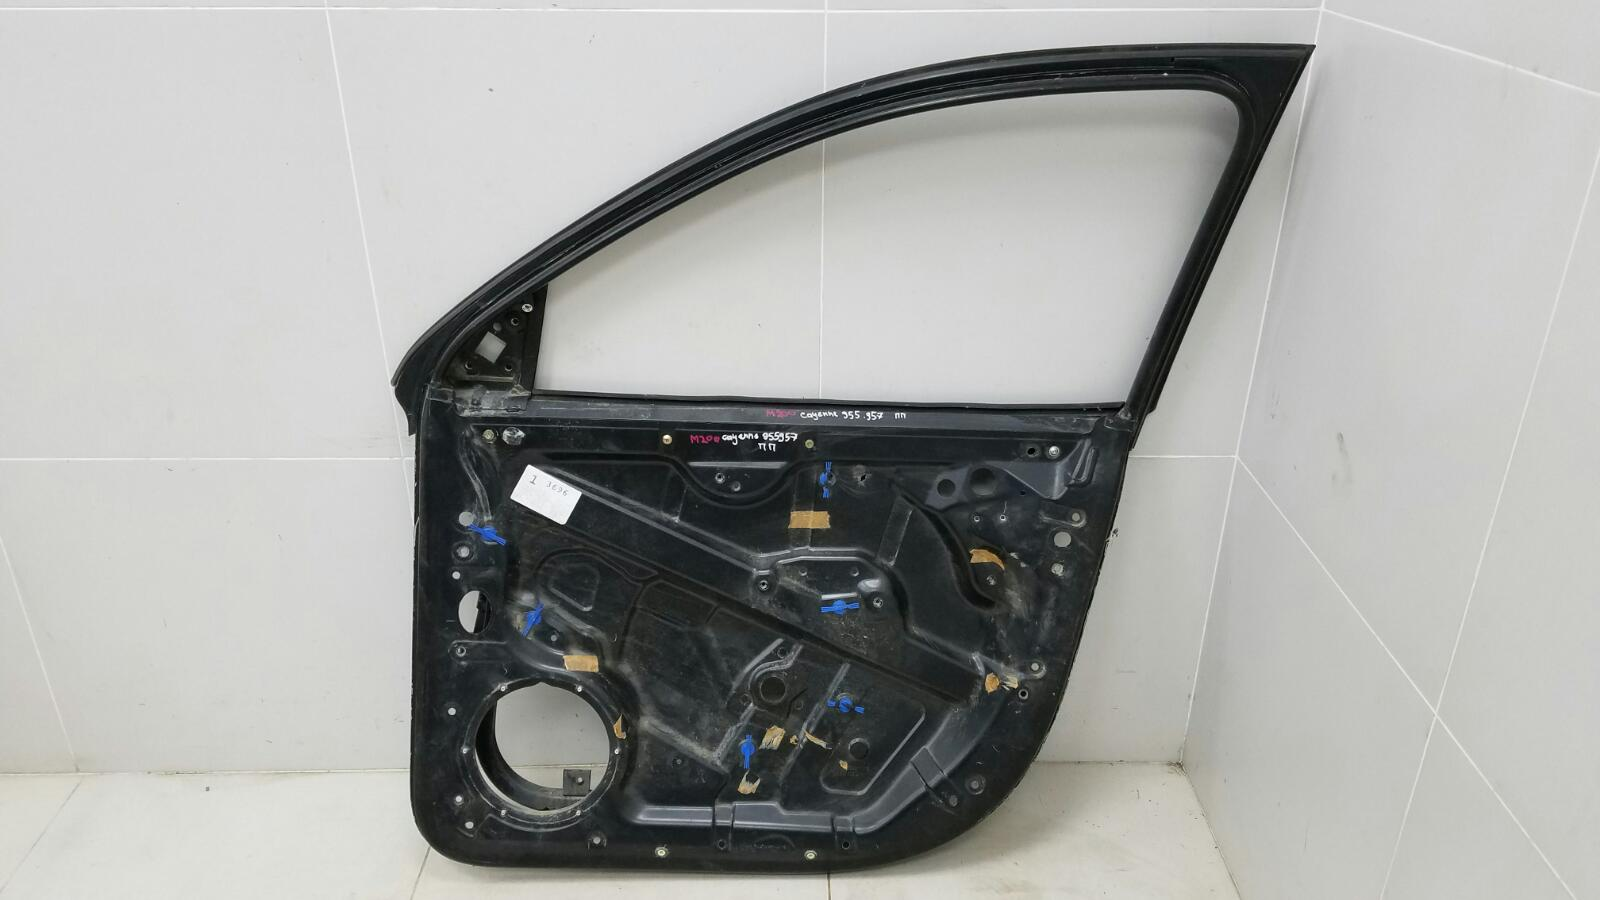 Рамка двери Porshe Cayenne 955 BMV M02.2Y 3.2Л 2005 передняя правая